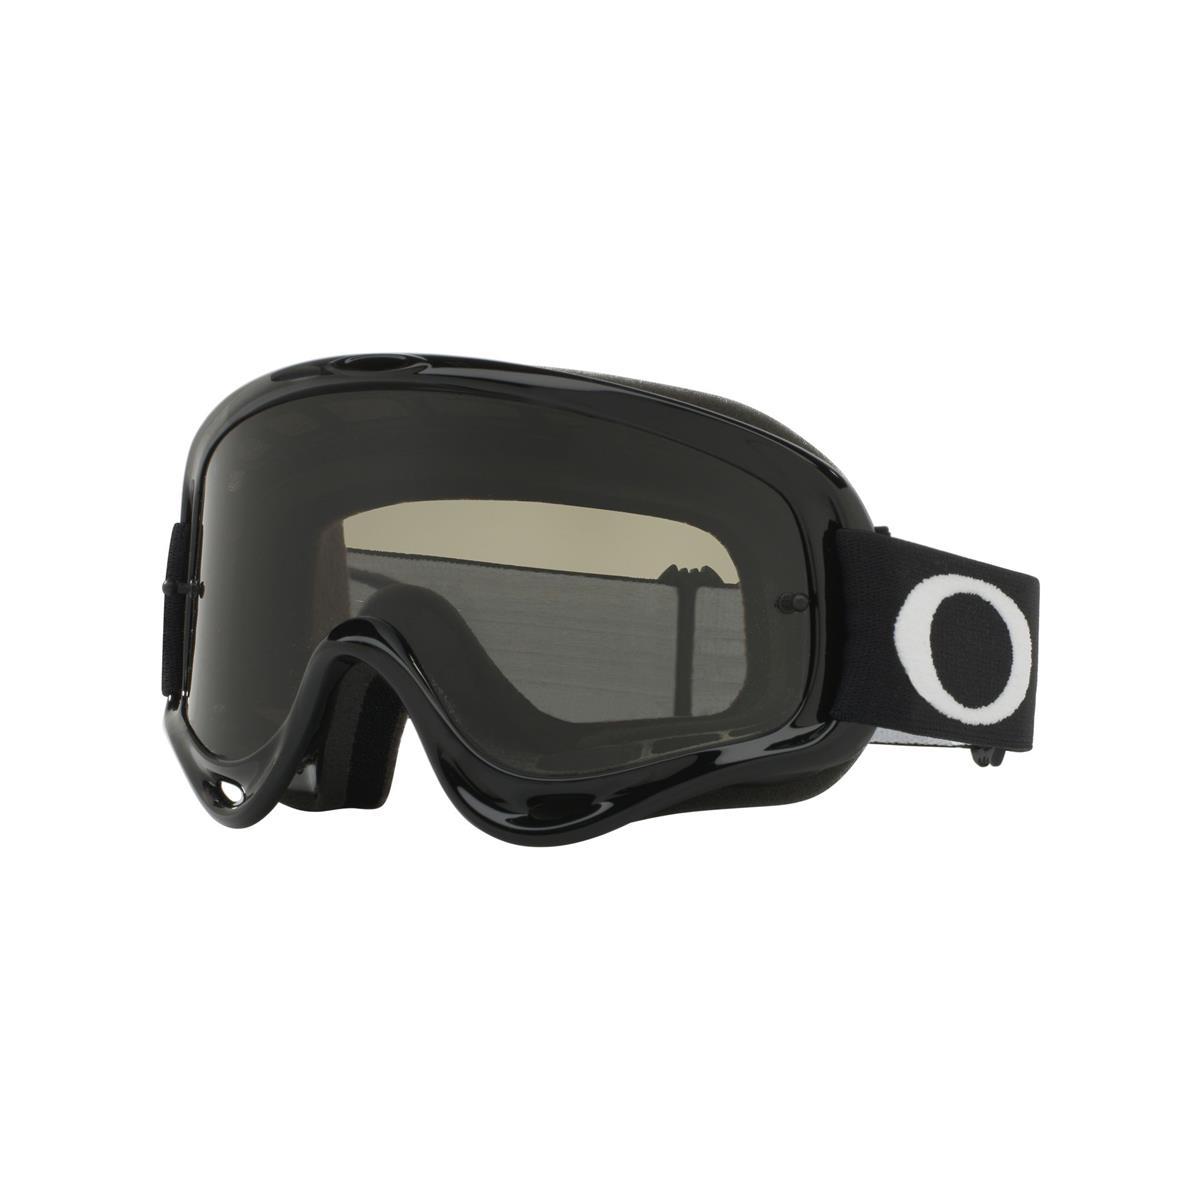 f695317fea Oakley MX Goggle O Frame MX Sand - Jet Black - Dark Grey 2019 ...